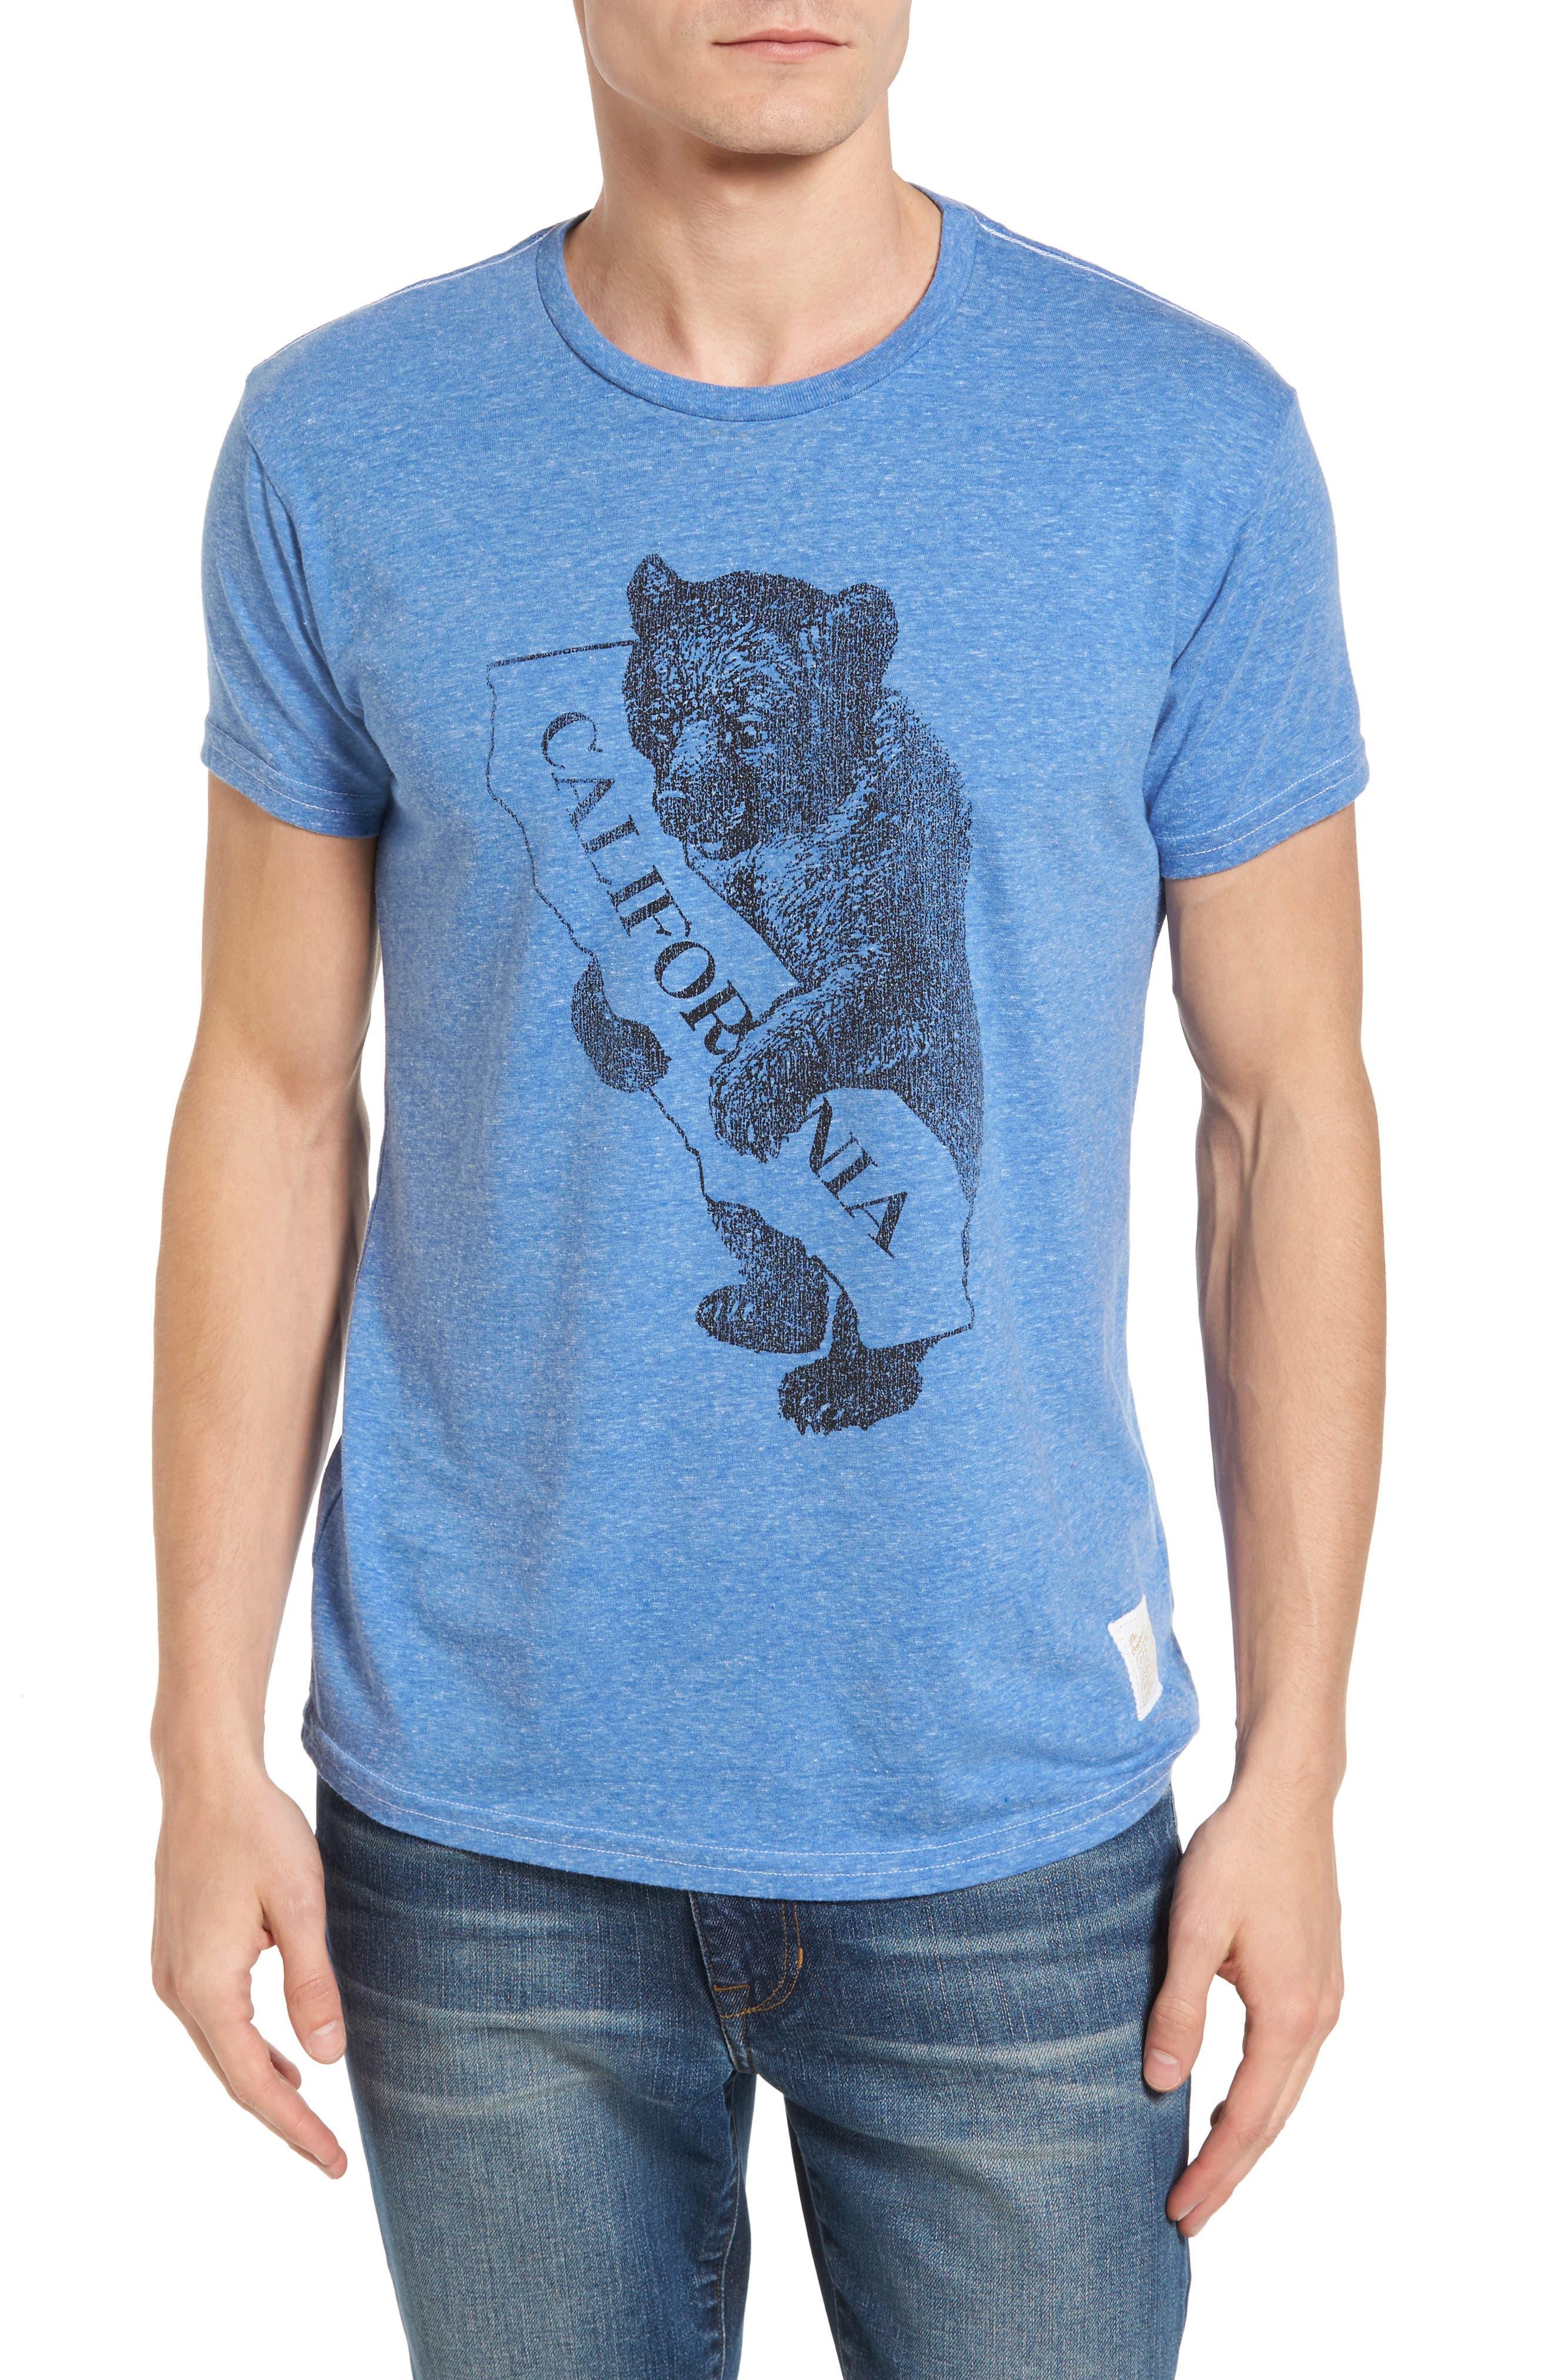 Main Image - Retro Brand California Republic T-Shirt